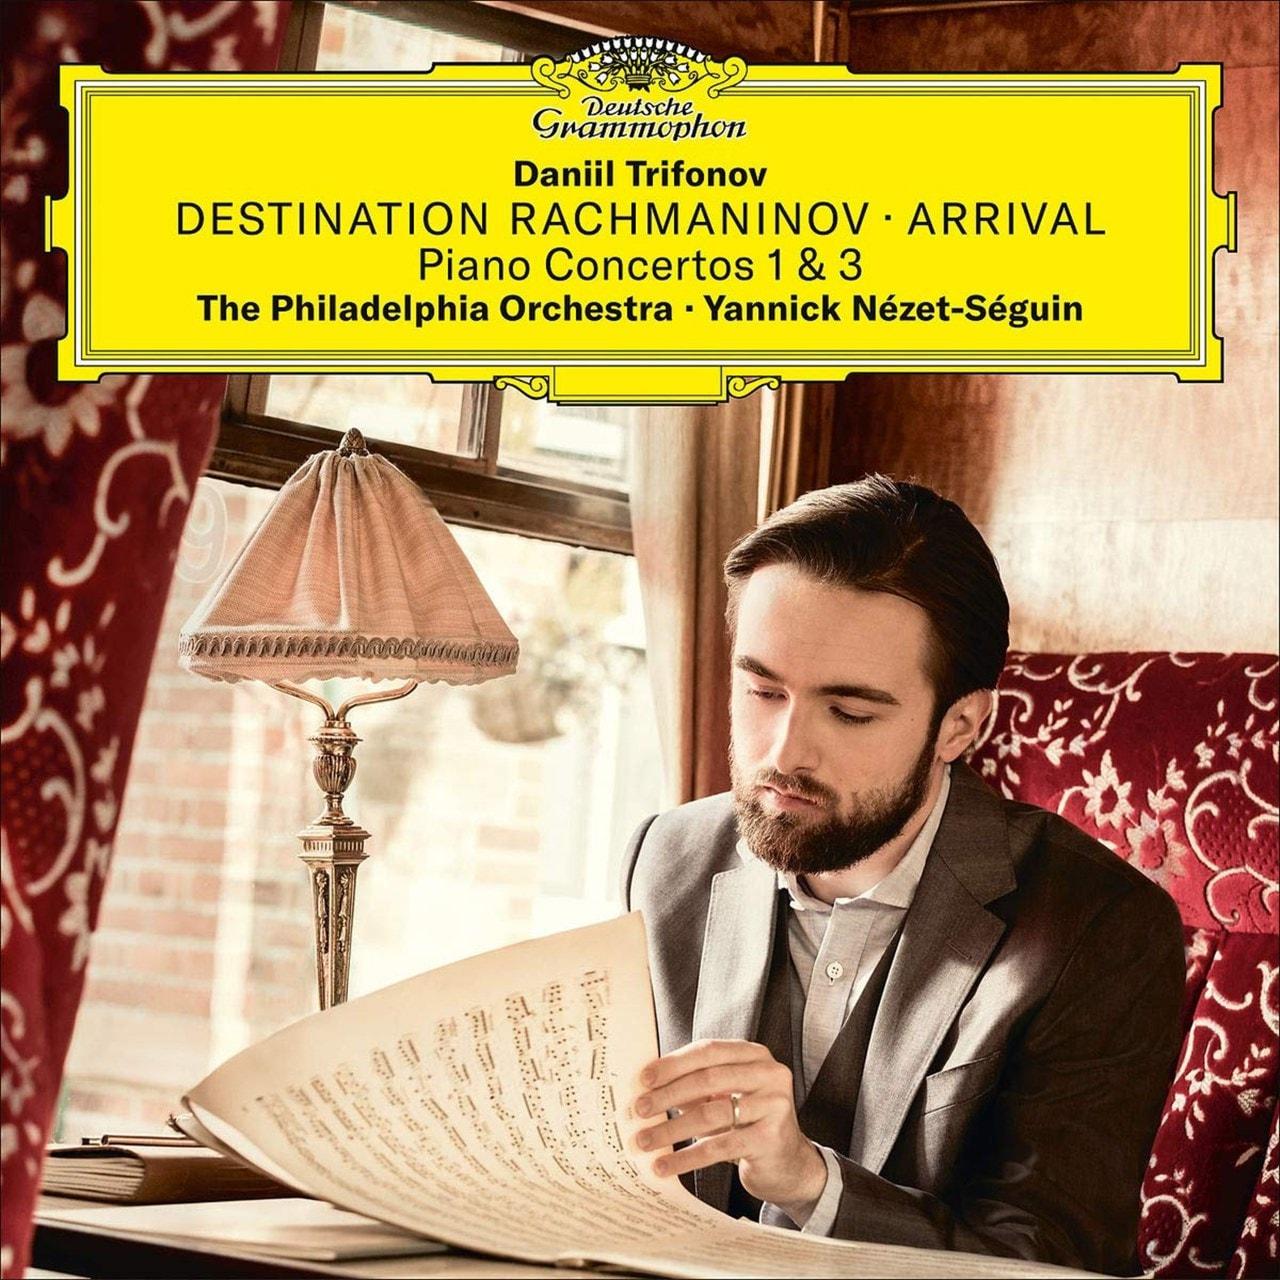 Daniil Trifonov: Destination Rachmaninov - Arrival: Piano Concertos 1 & 3 - 1